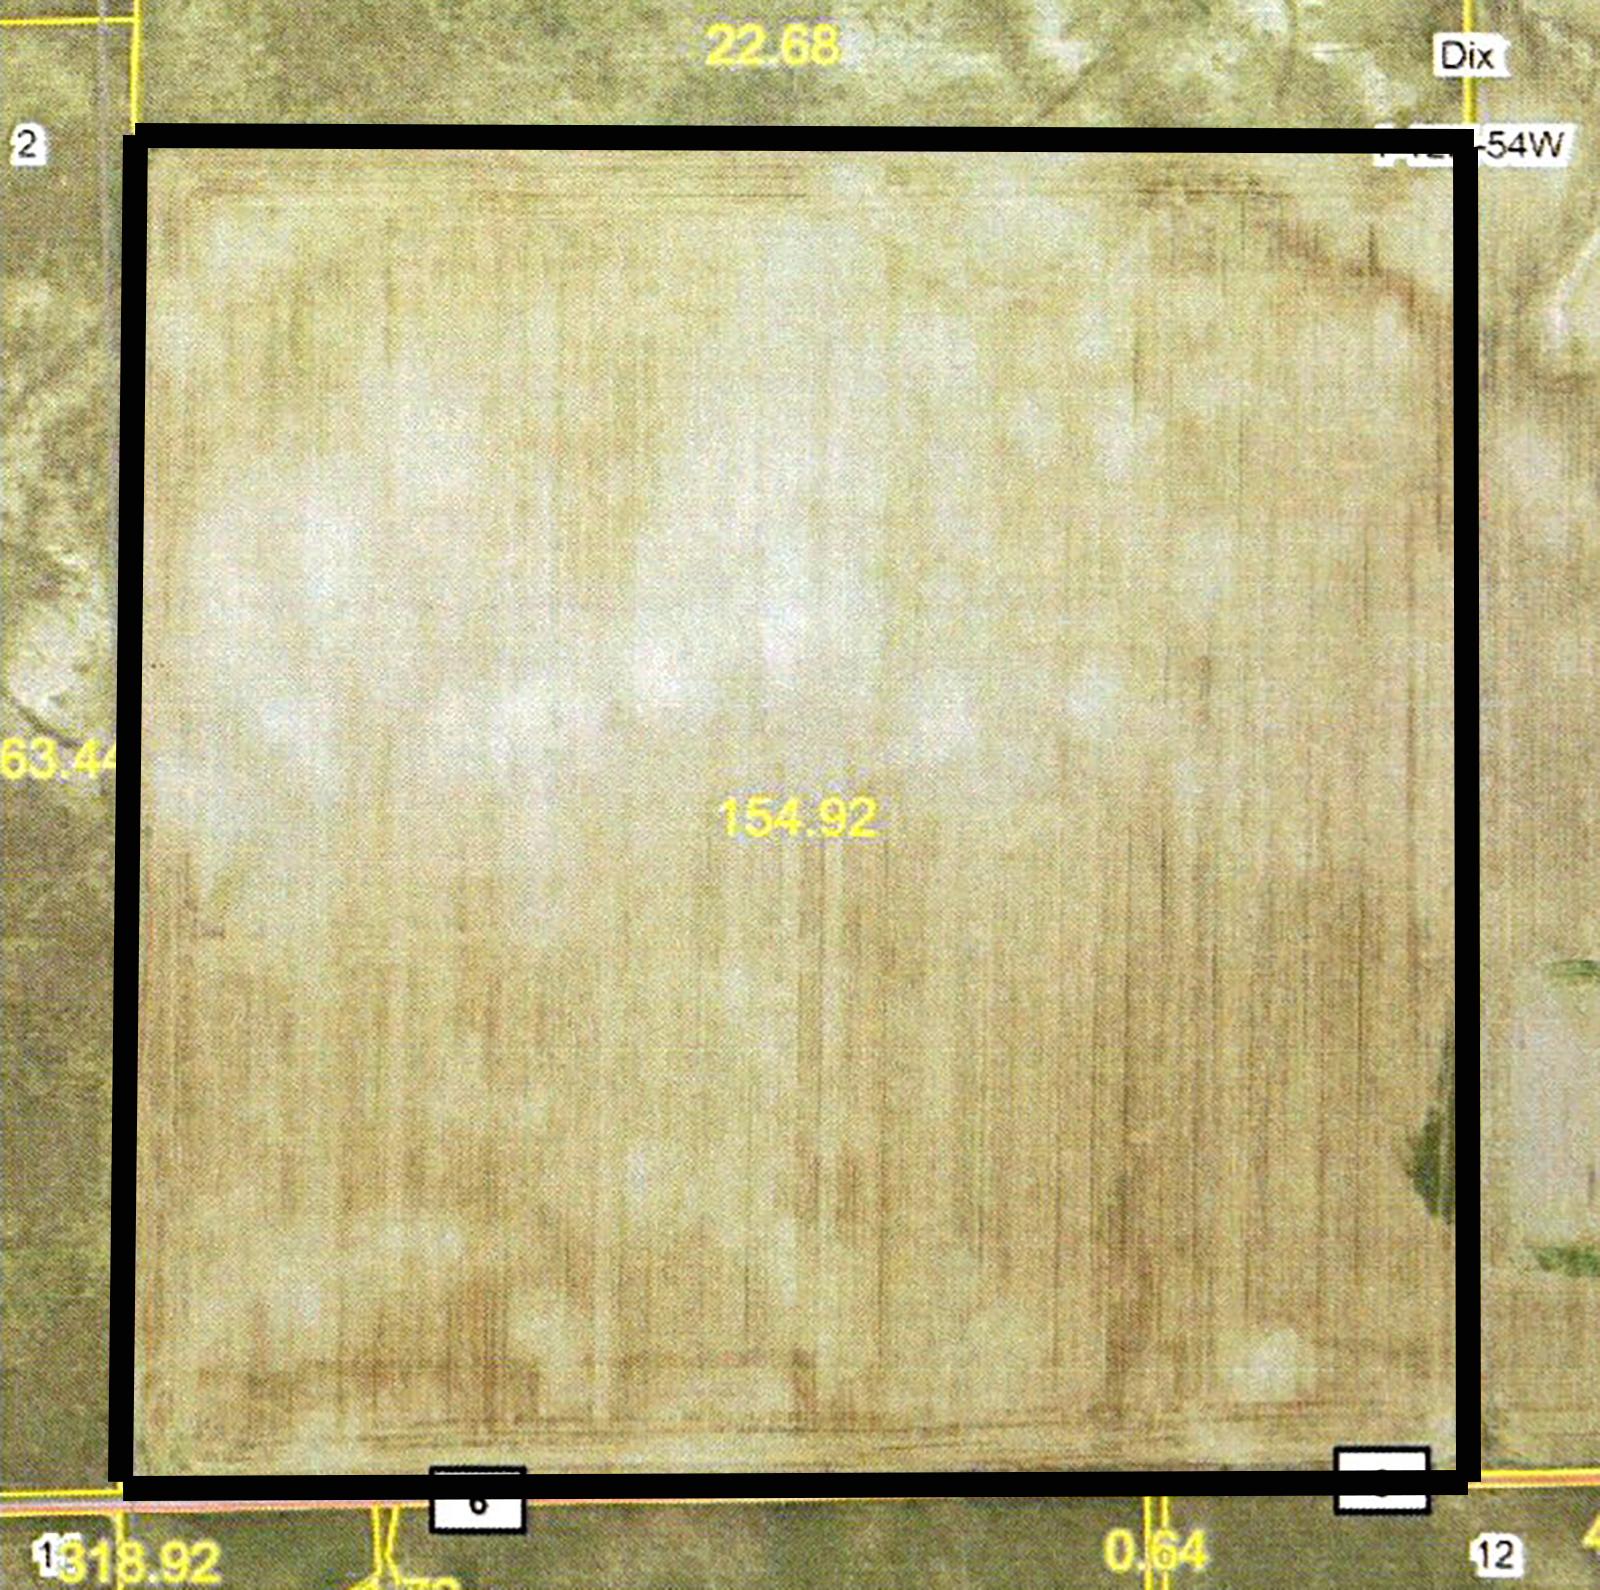 K1 Aerial Map